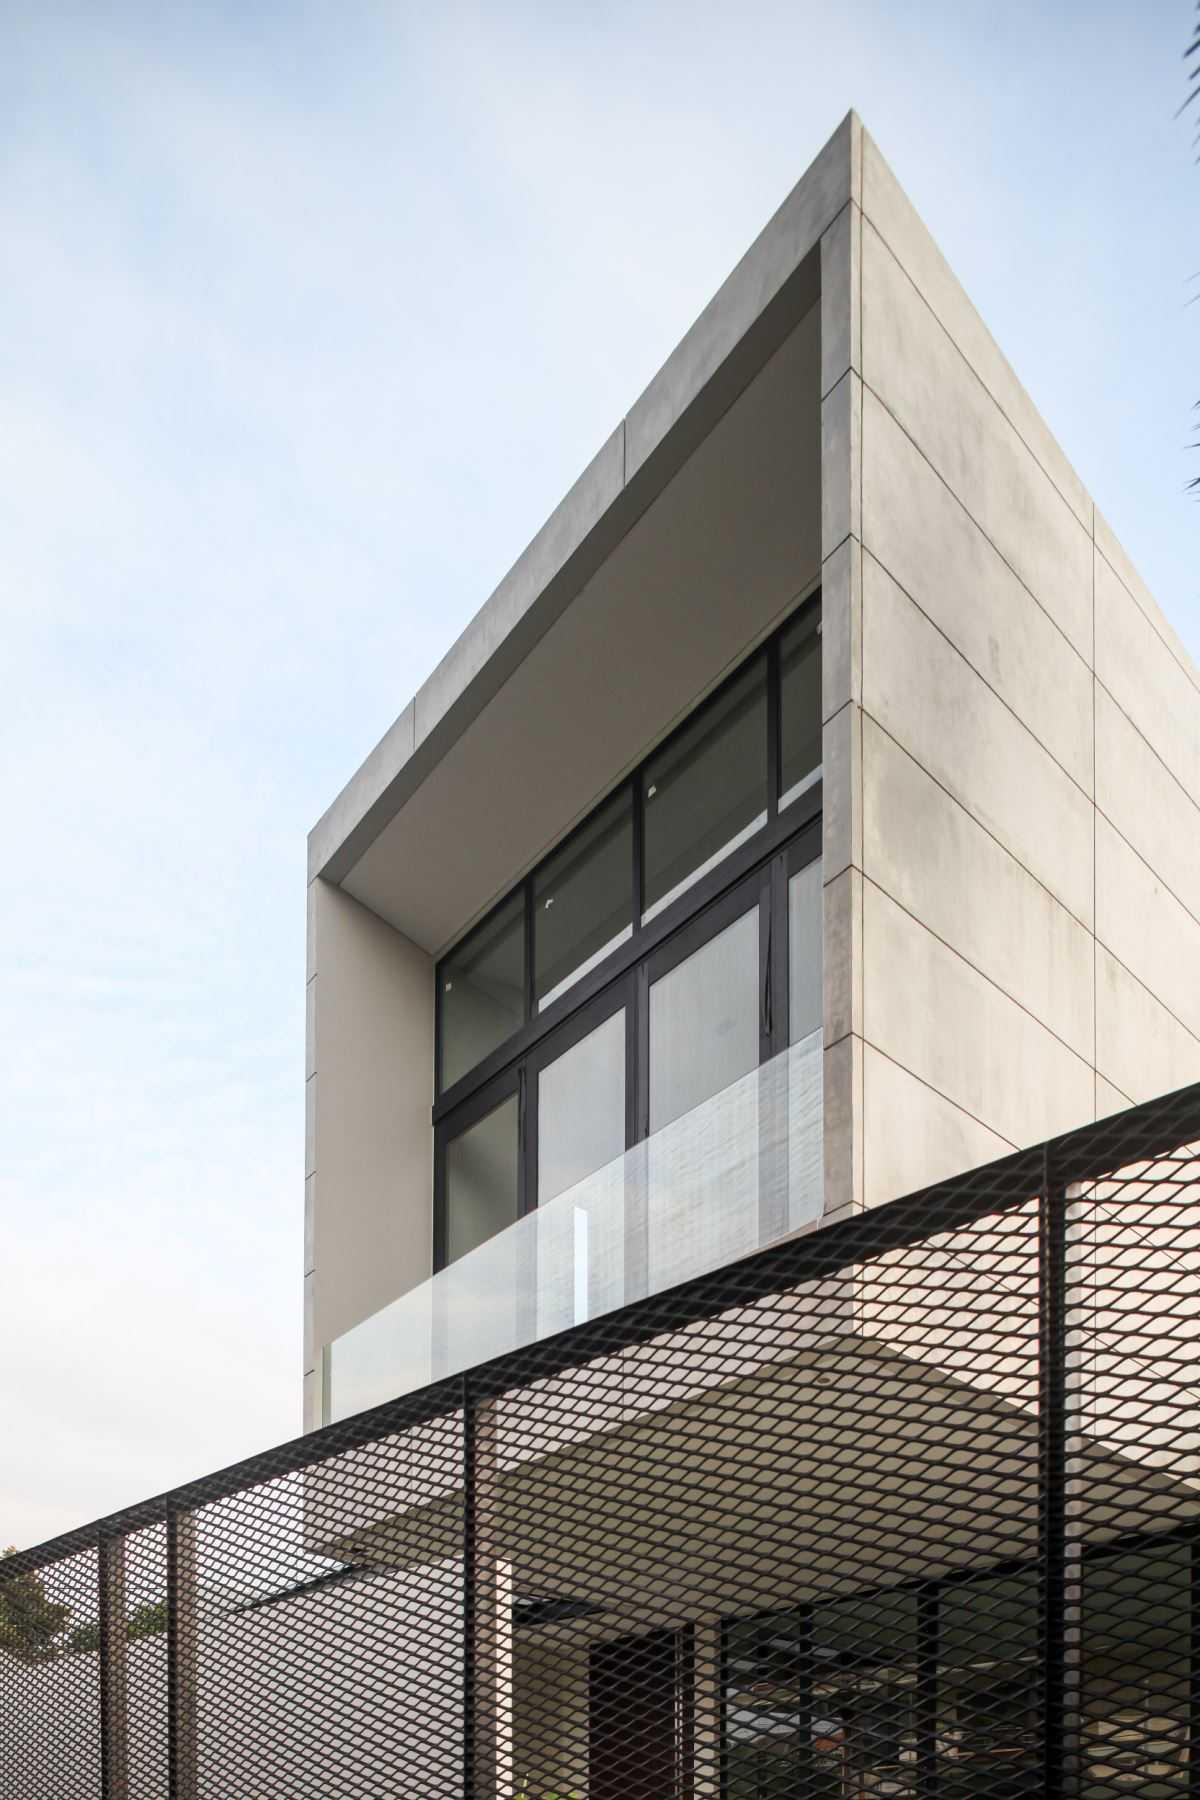 Ivan Priatman Architecture Rl House Surabaya, Kota Sby, Jawa Timur, Indonesia Surabaya, Kota Sby, Jawa Timur, Indonesia Ivan-Priatman-Architecture-Rl-House   59090